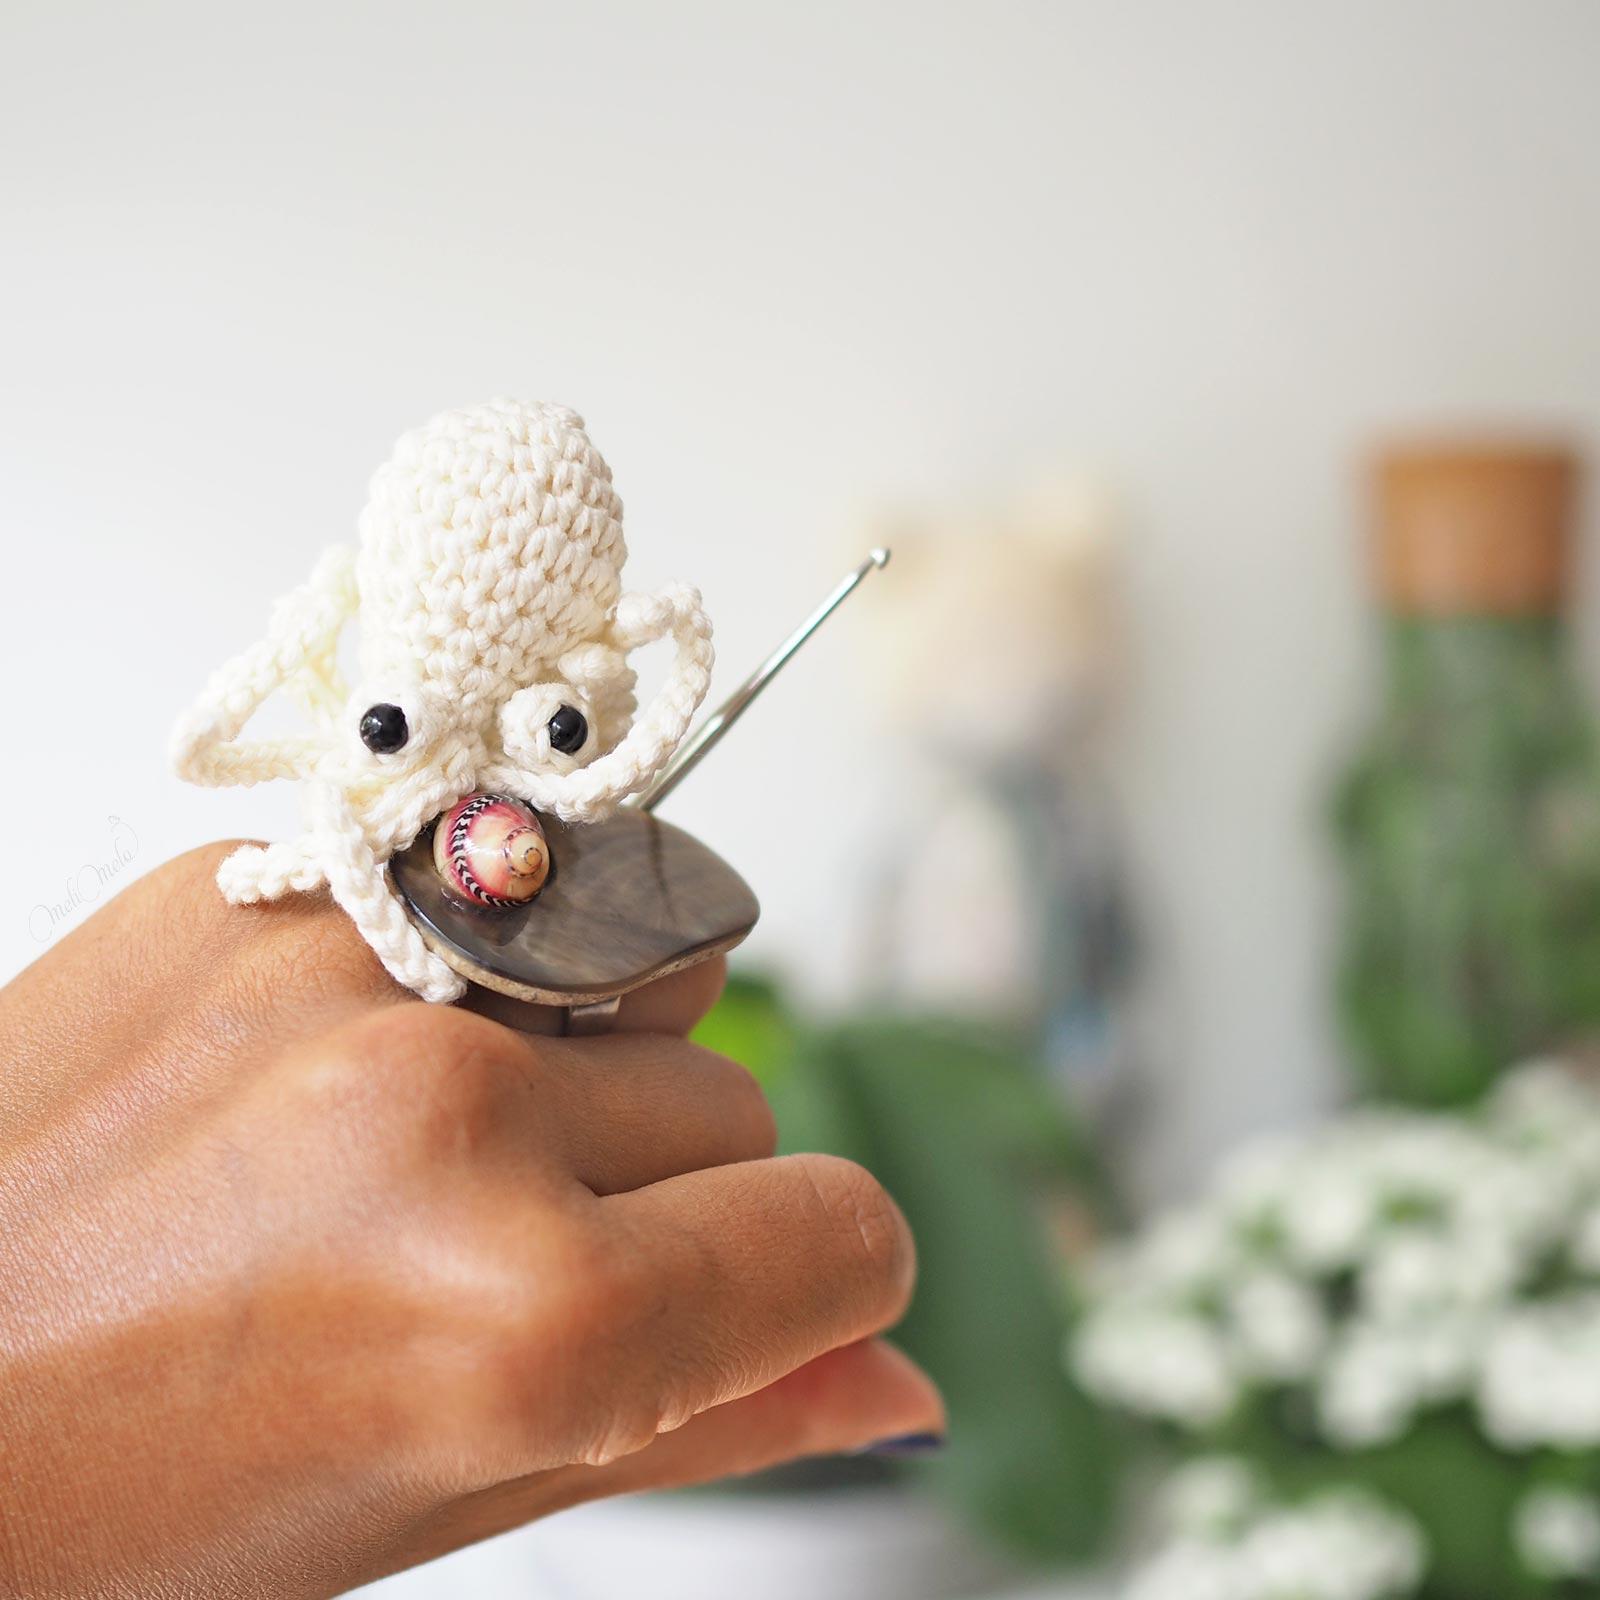 crochet amigurumi mini poulpe octopus happycrochetetc boutique MeliMelo bague Nature Bijoux